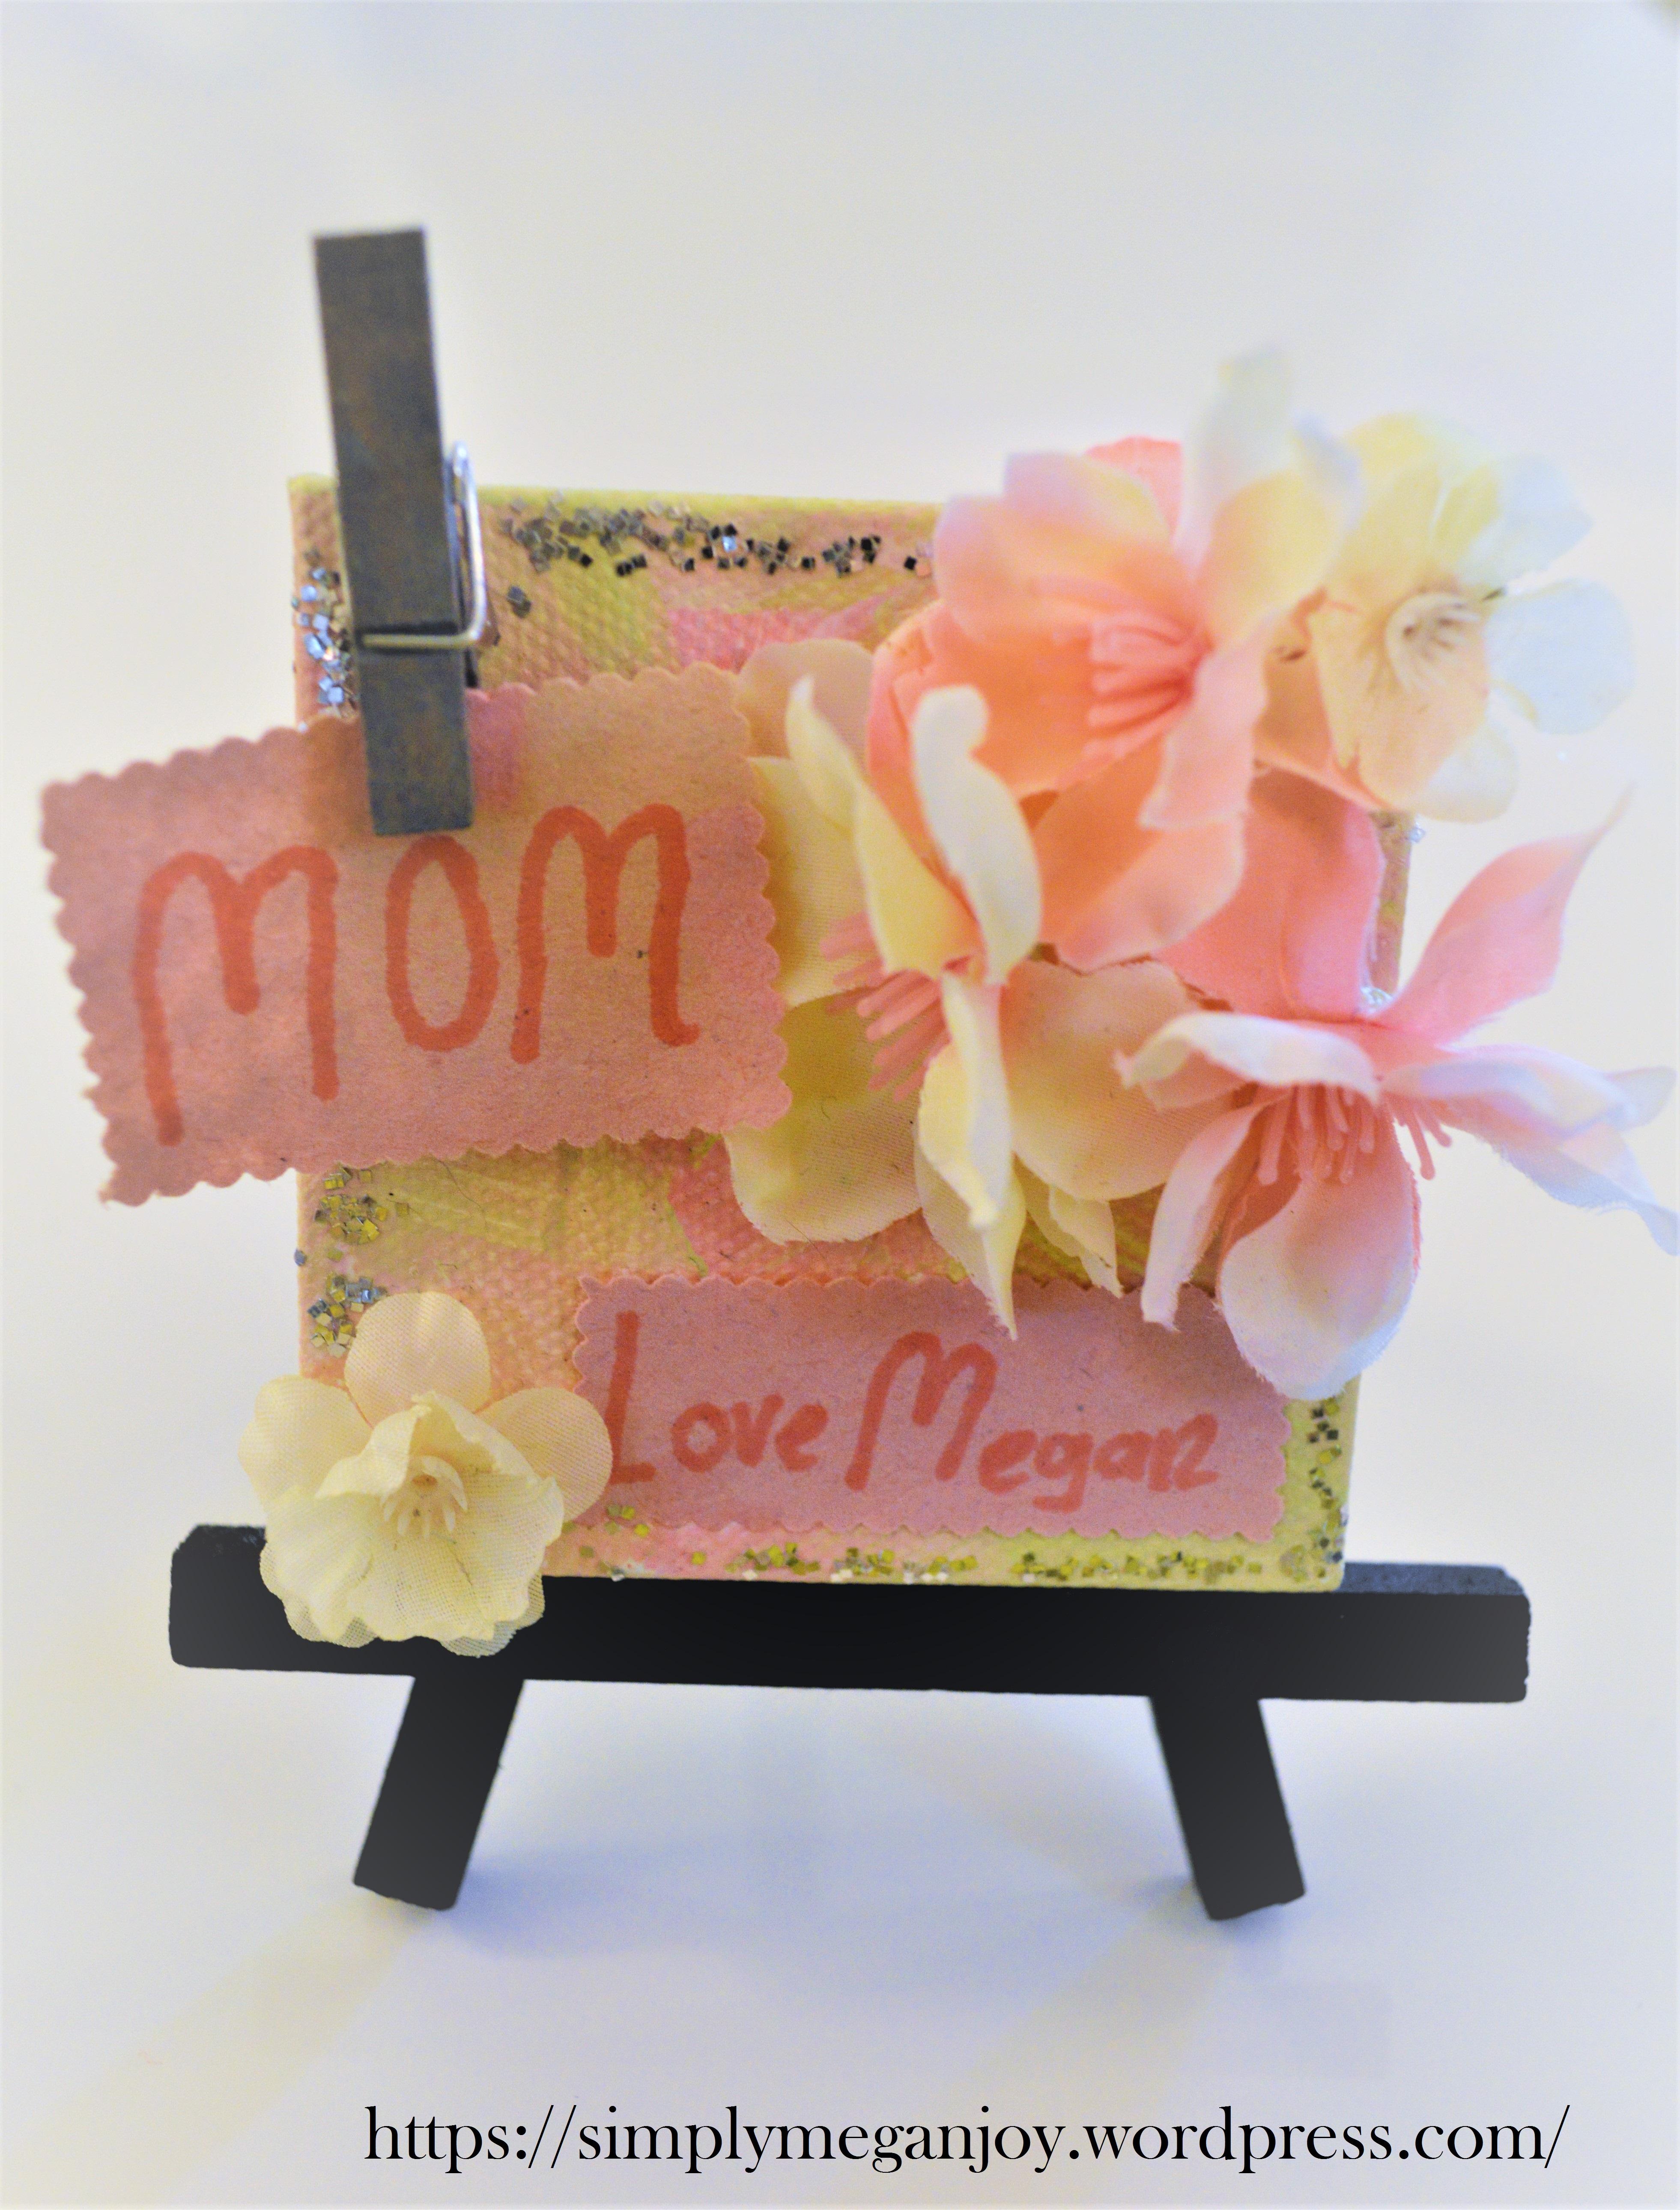 Mother_s Day - DIY Creation - Simply Megan Joy Blog 4